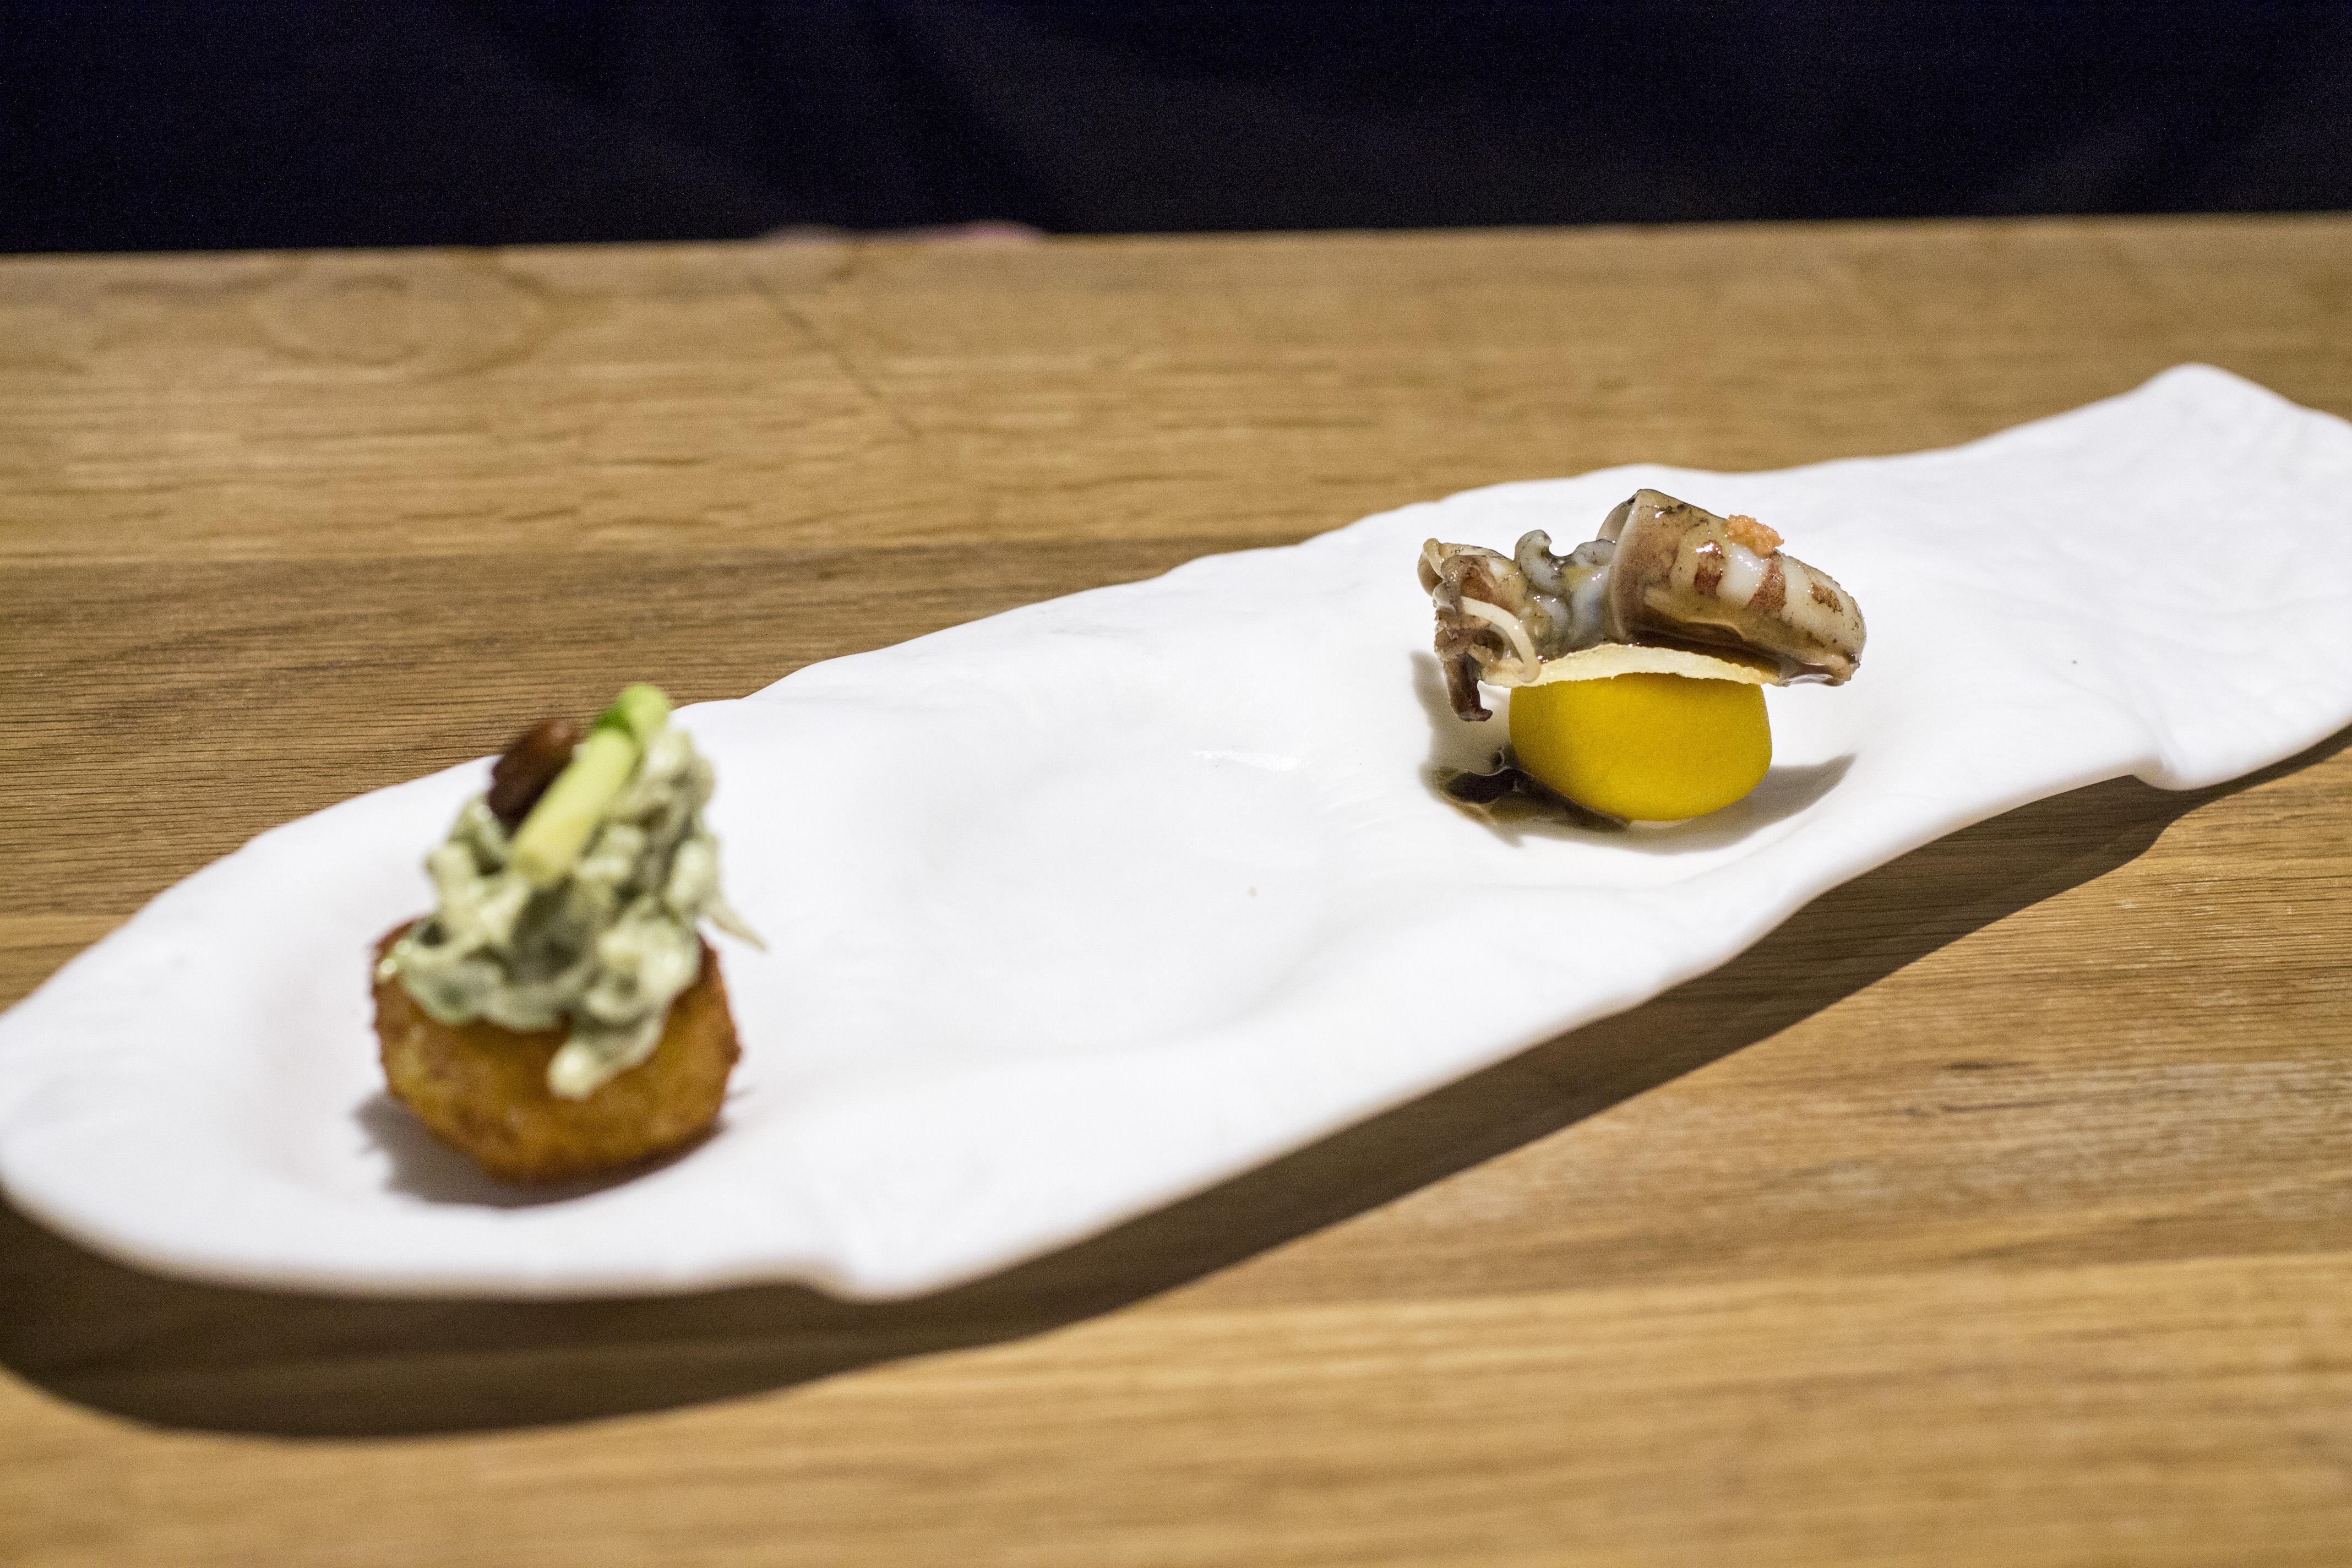 Causa, Pakta, Chef Albert Adrià, Kyoko li, Barcelona